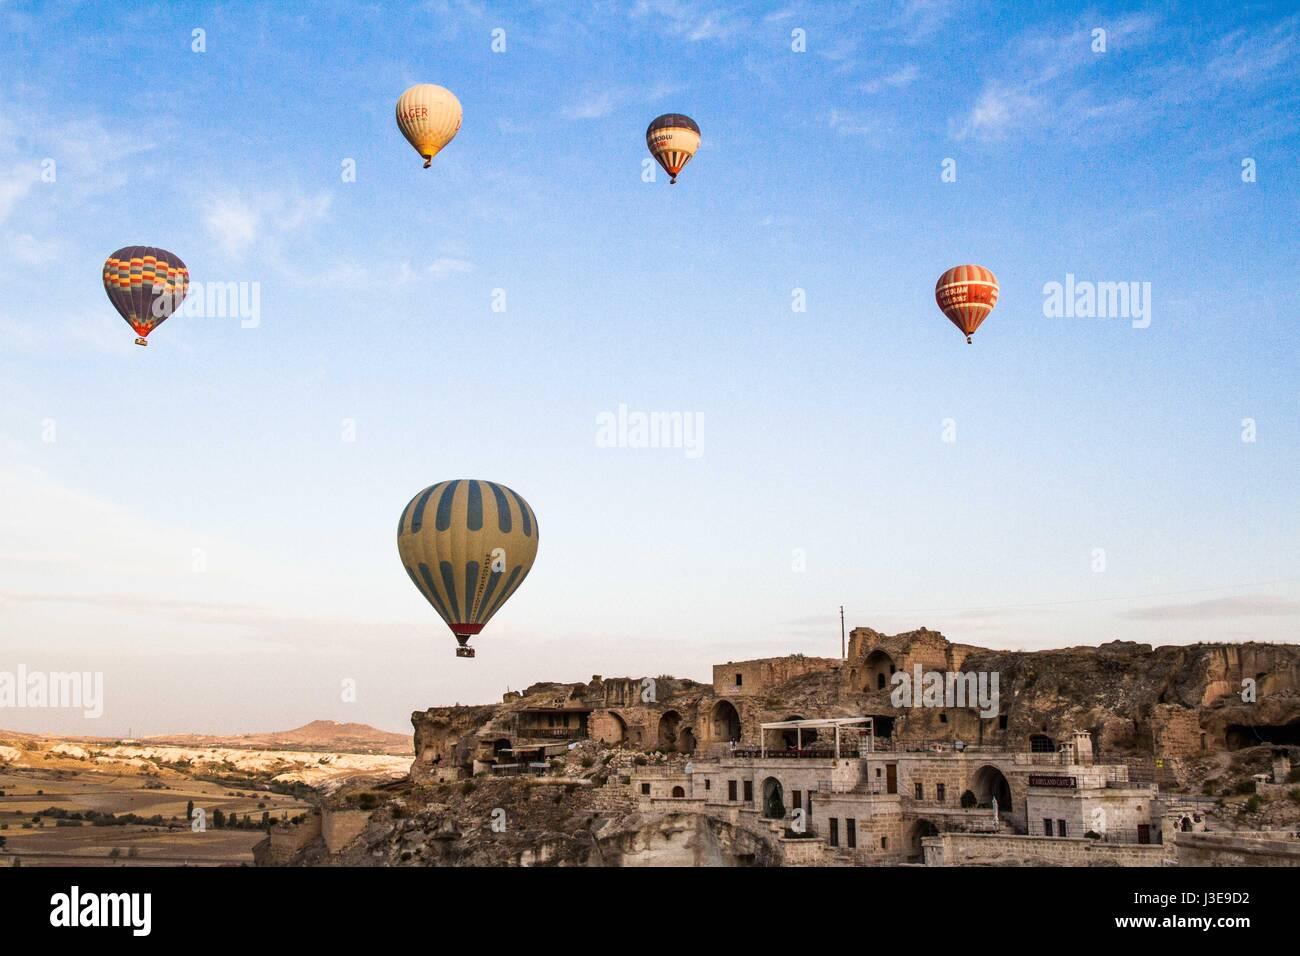 Palloni Ad Aria Calda.I Palloni Ad Aria Calda In Cappadocia Turchia Foto Immagine